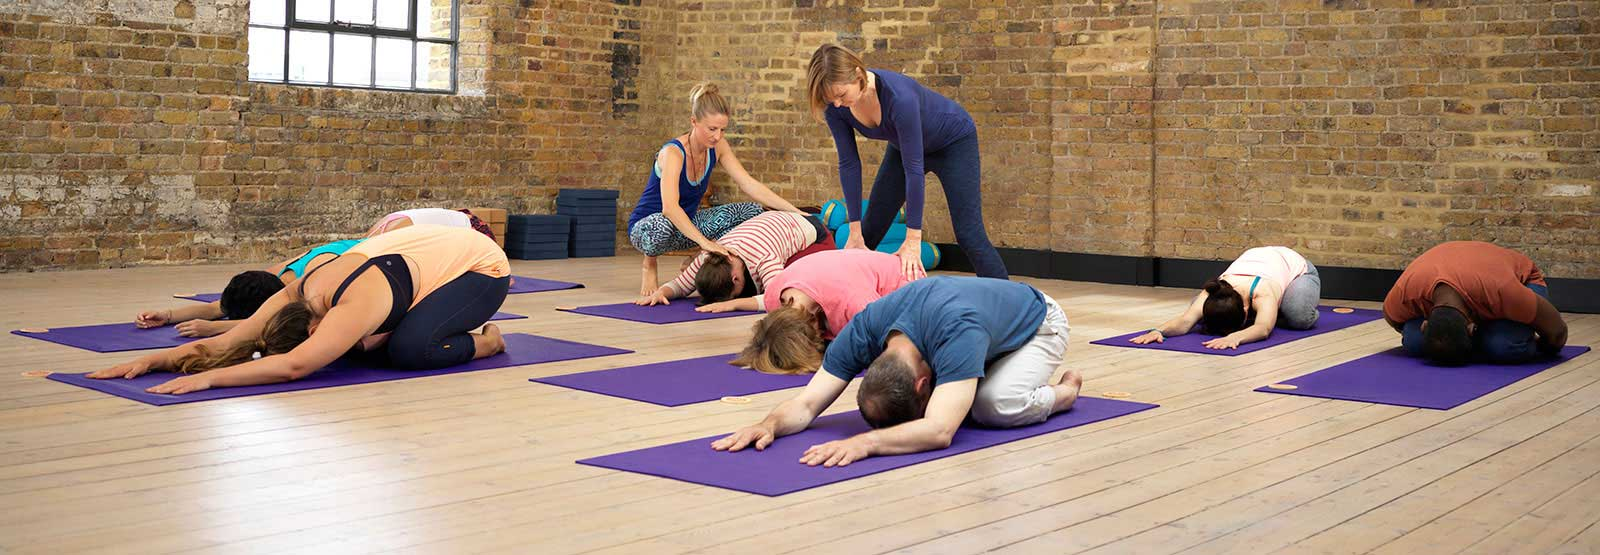 IYTT, accredited, 200, hour, Scaravelli, yoga, teacher, training, course, ttc, Camden, London, Catherine Annis, UK